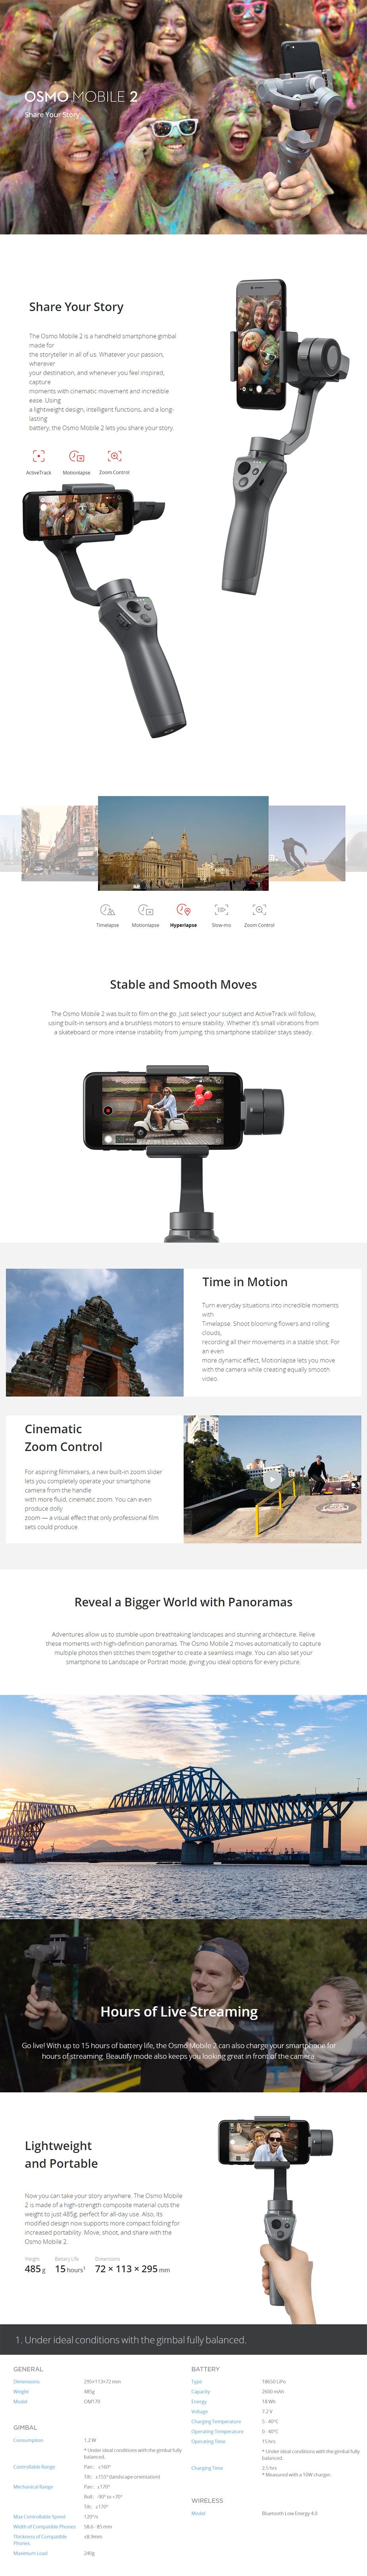 DJI Osmo Mobile 2 Smartphone Gimbal - Desktop Overview 1